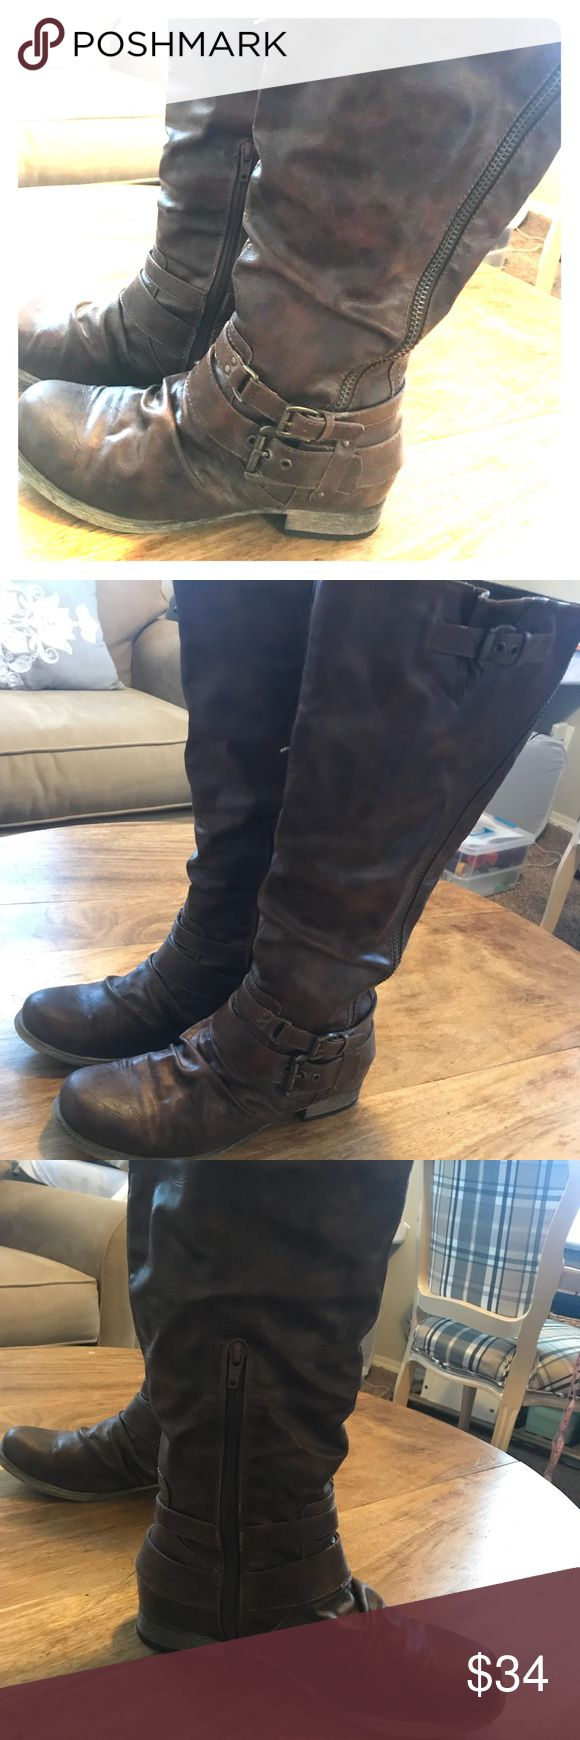 Carlos Santana Boots Excellent Condition, worn less than 10x. Dark brown, size 8 Carlos Santana Shoes Winter & Rain Boots